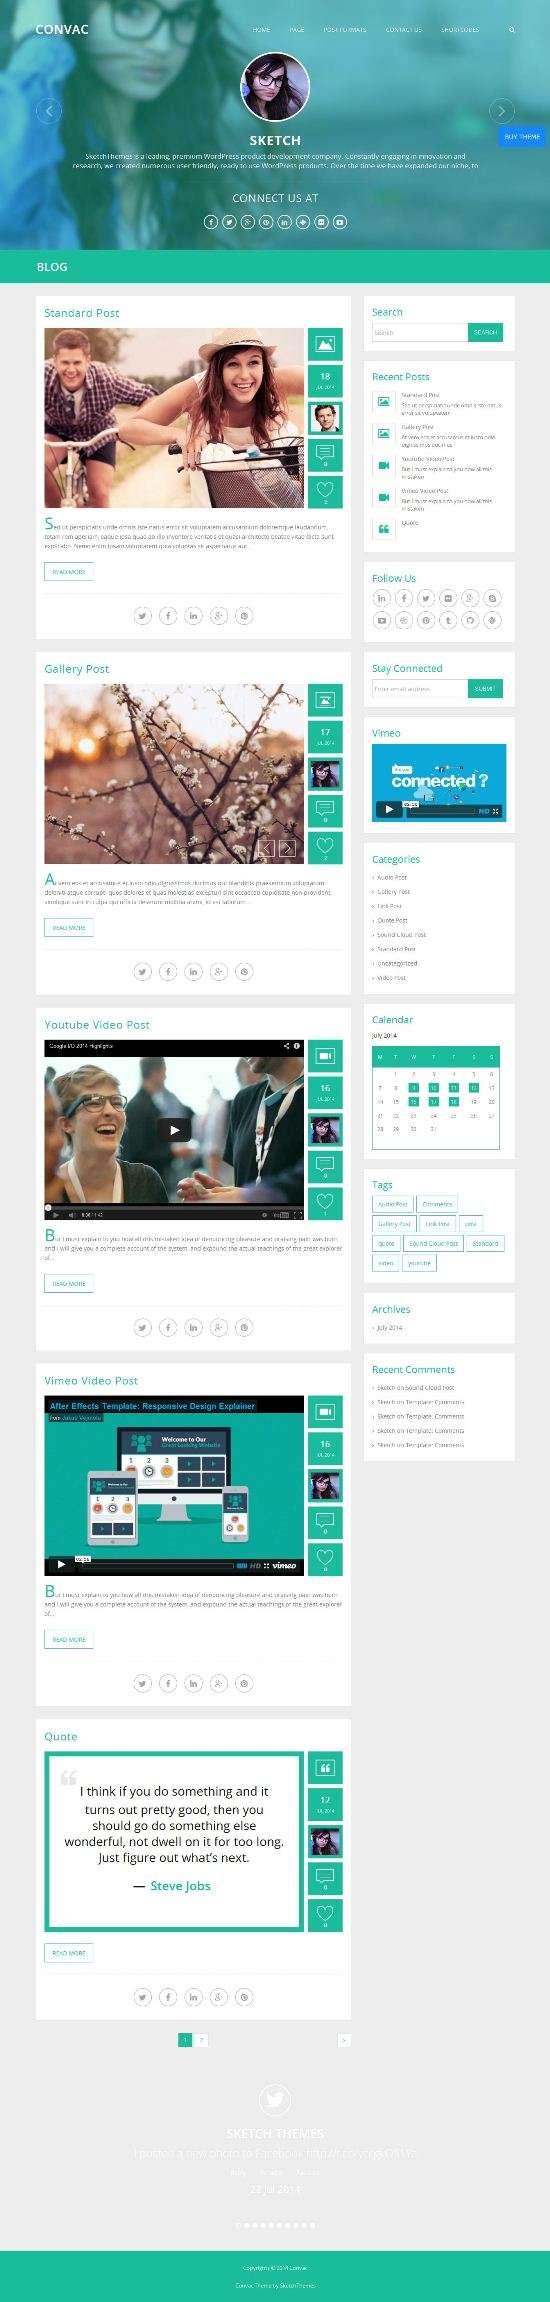 convac sketch themes avjthemescom 01 - Convac WordPress Theme